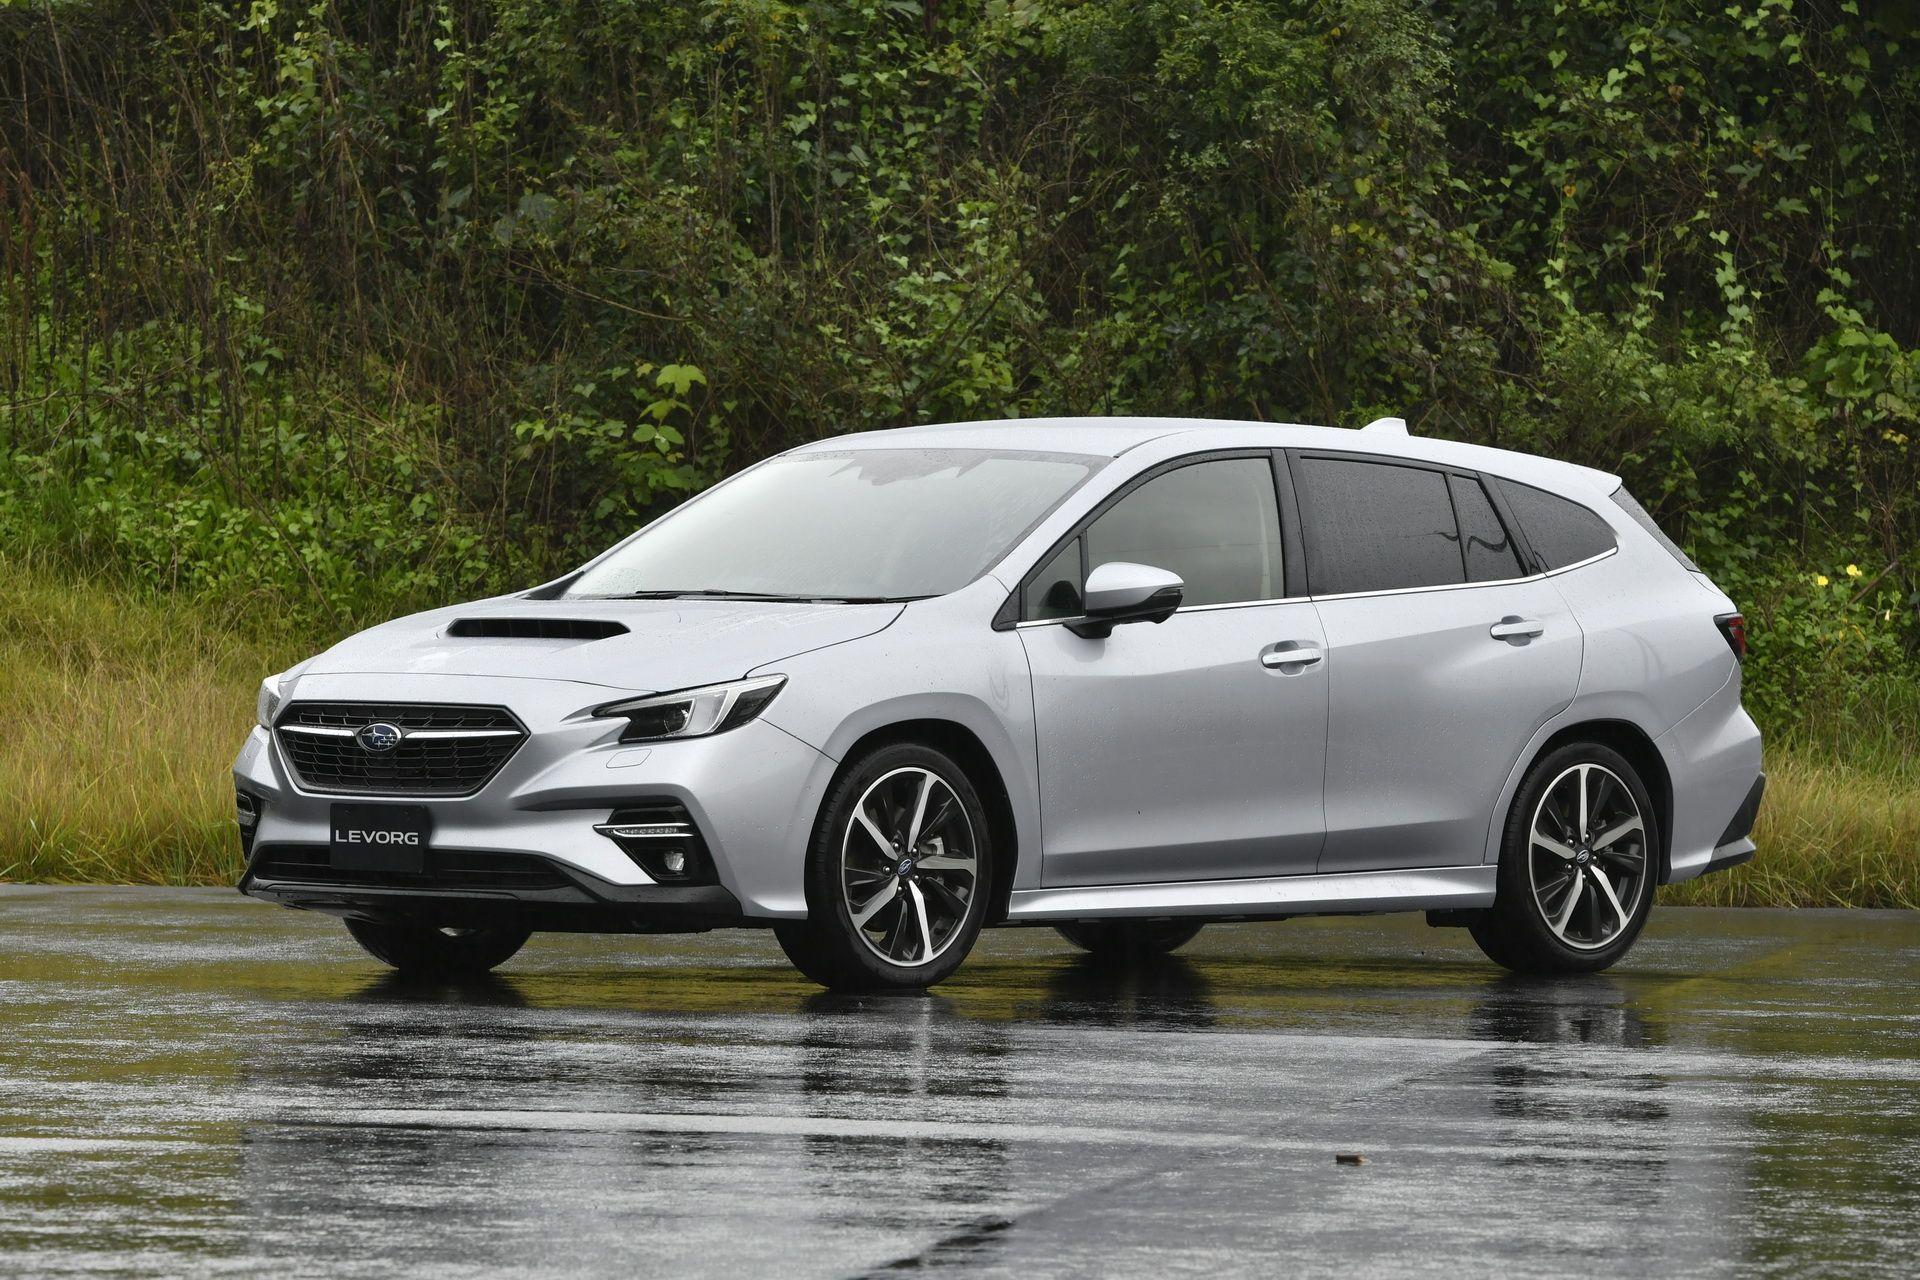 2021_Subaru_Levorg_0026